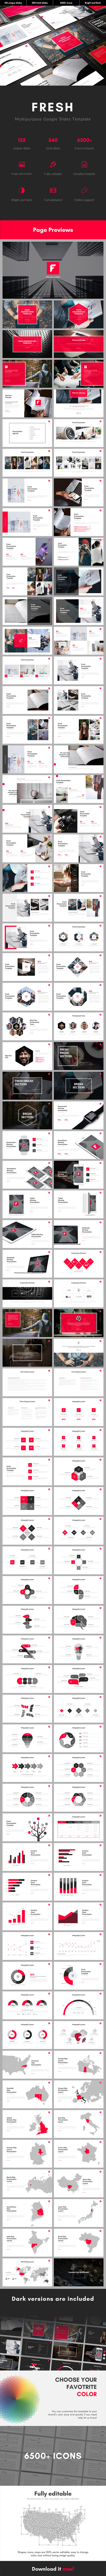 GraphicRiver Fresh Multipurpose Google Slides Template 21050667